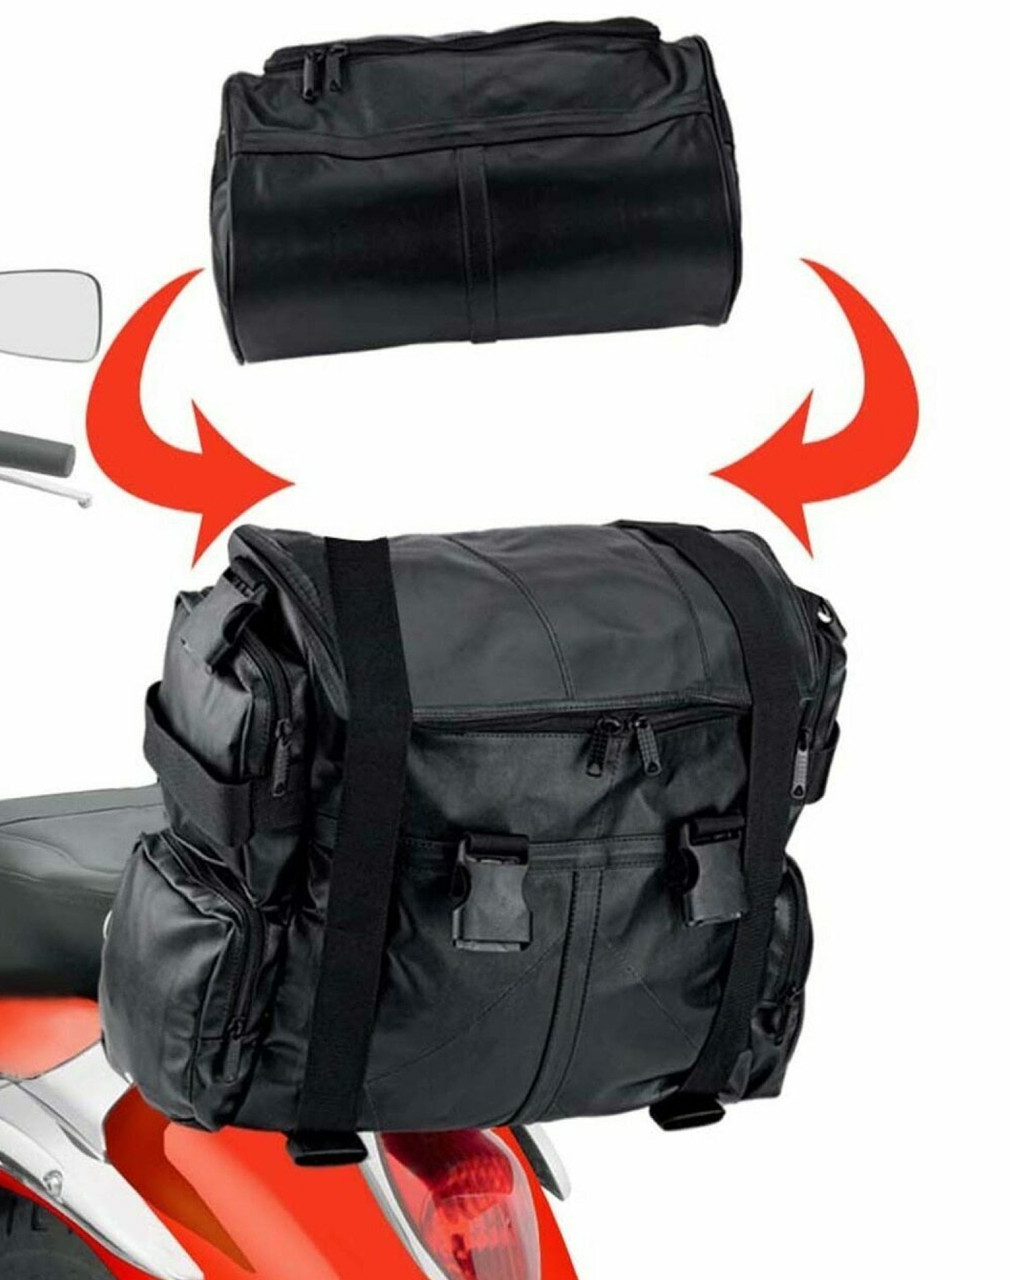 Victory Viking Aero Medium Expandable Motorcycle Sissy Bar Bags